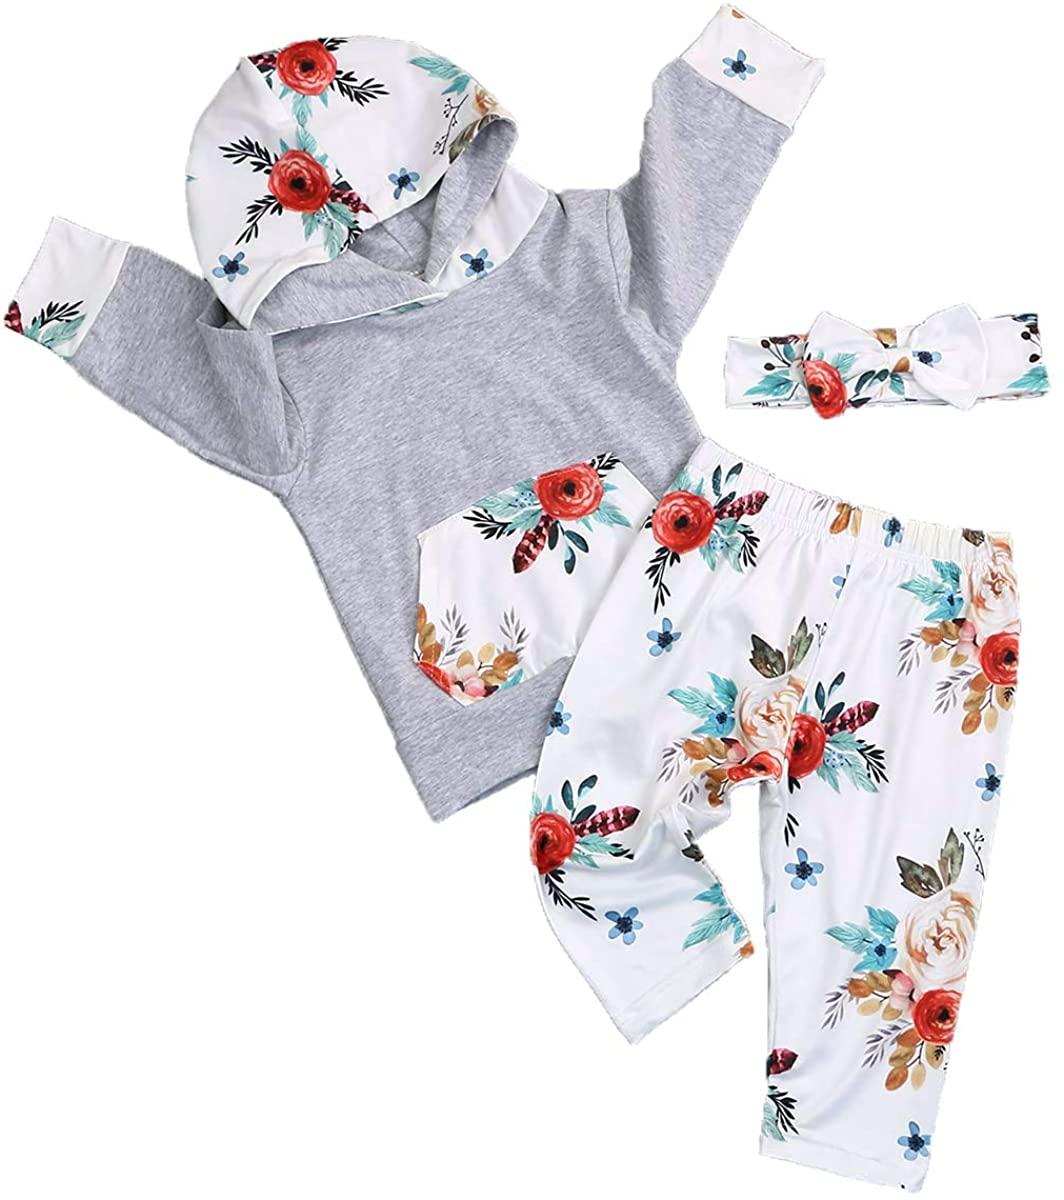 Toddler Baby Girls Clothes Long Sleeve Hoodie Kangaroo Pocket Sweatshirt Floral Pants +Headband 3Pcs Outfit Sets